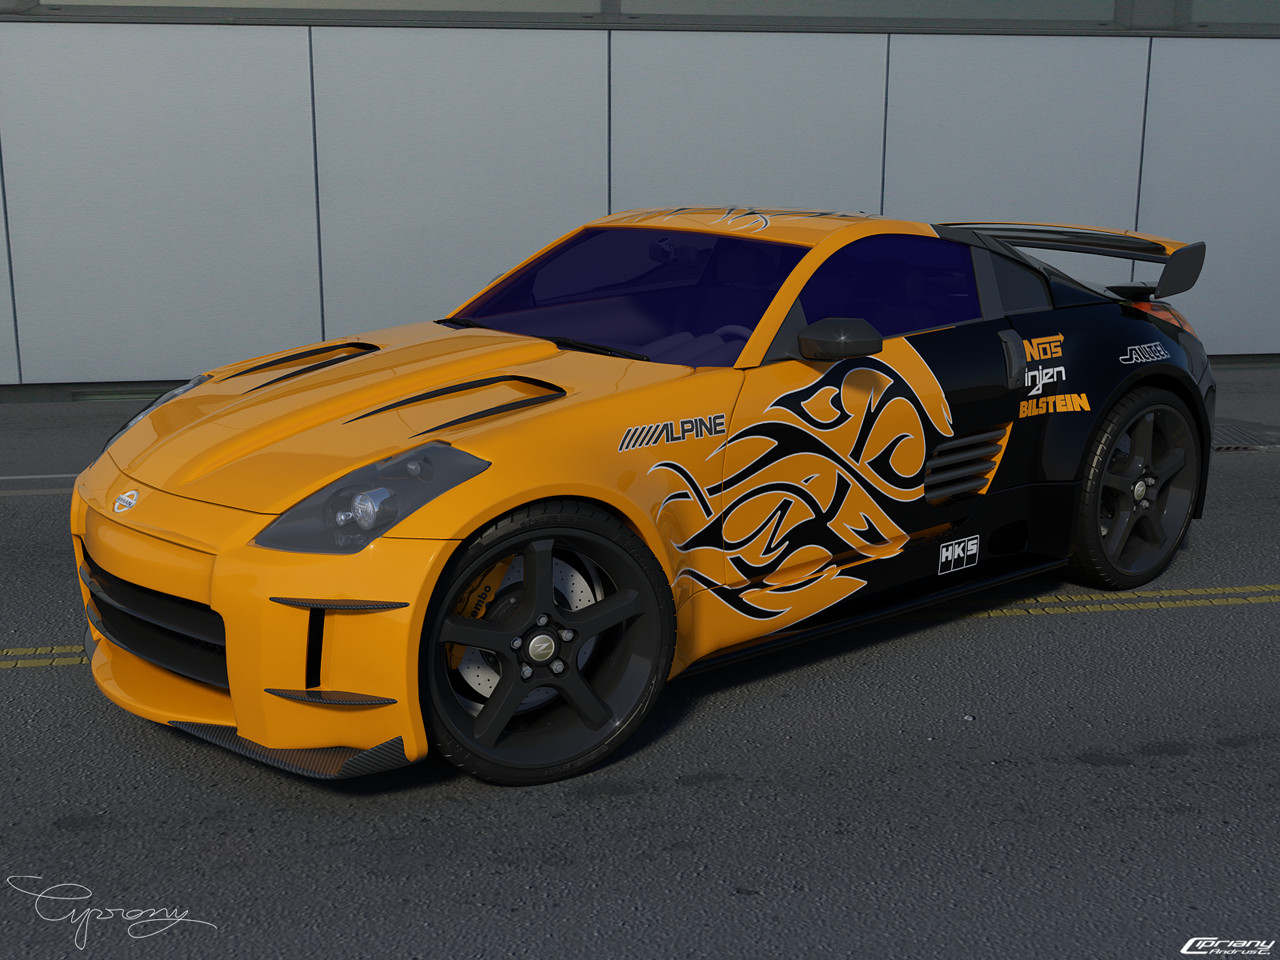 Beautiful Nice Street Racing Cars Photo - Classic Cars Ideas - boiq.info